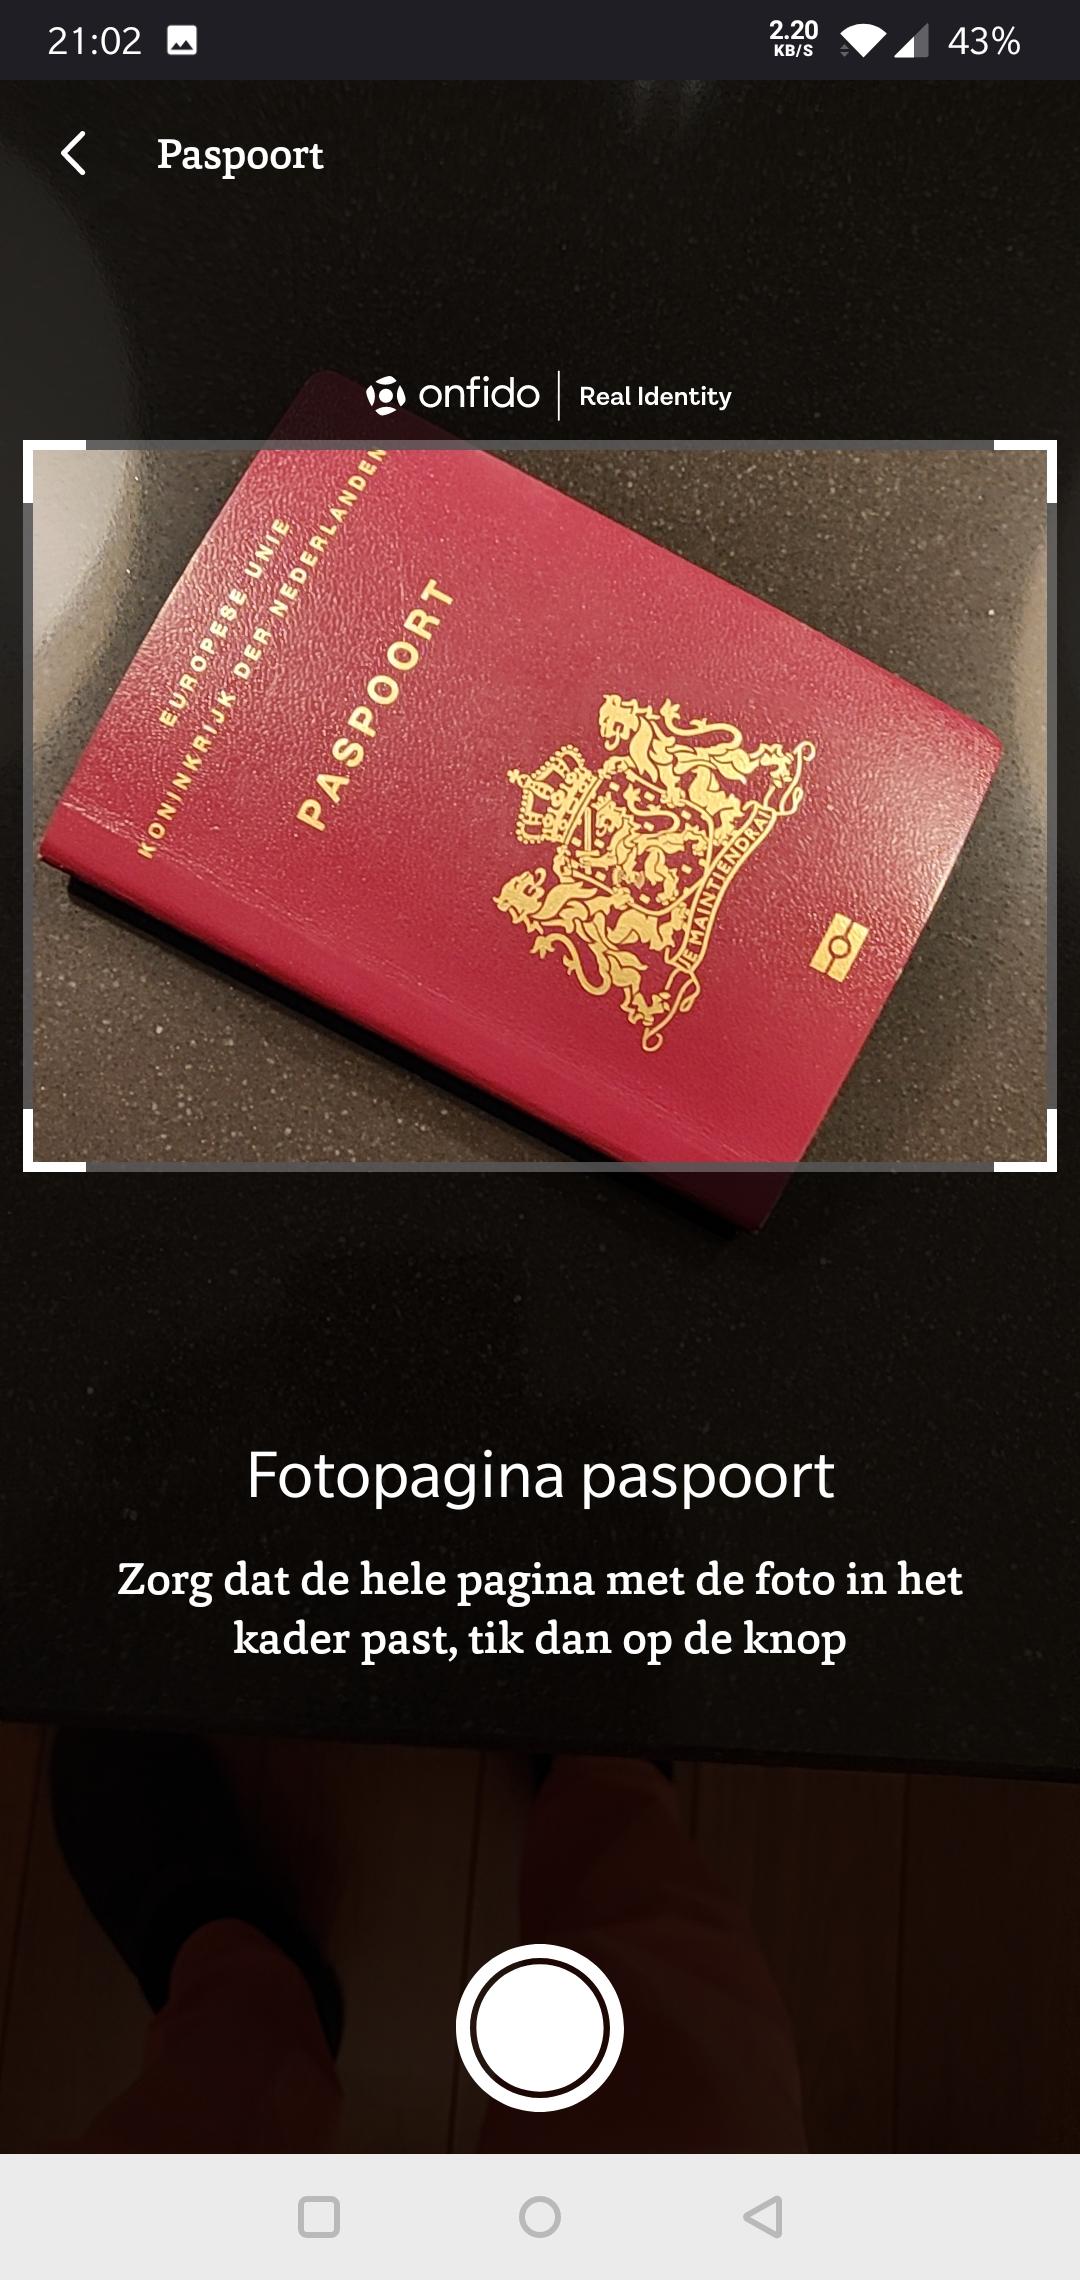 Bux Zero fotopagina paspoort